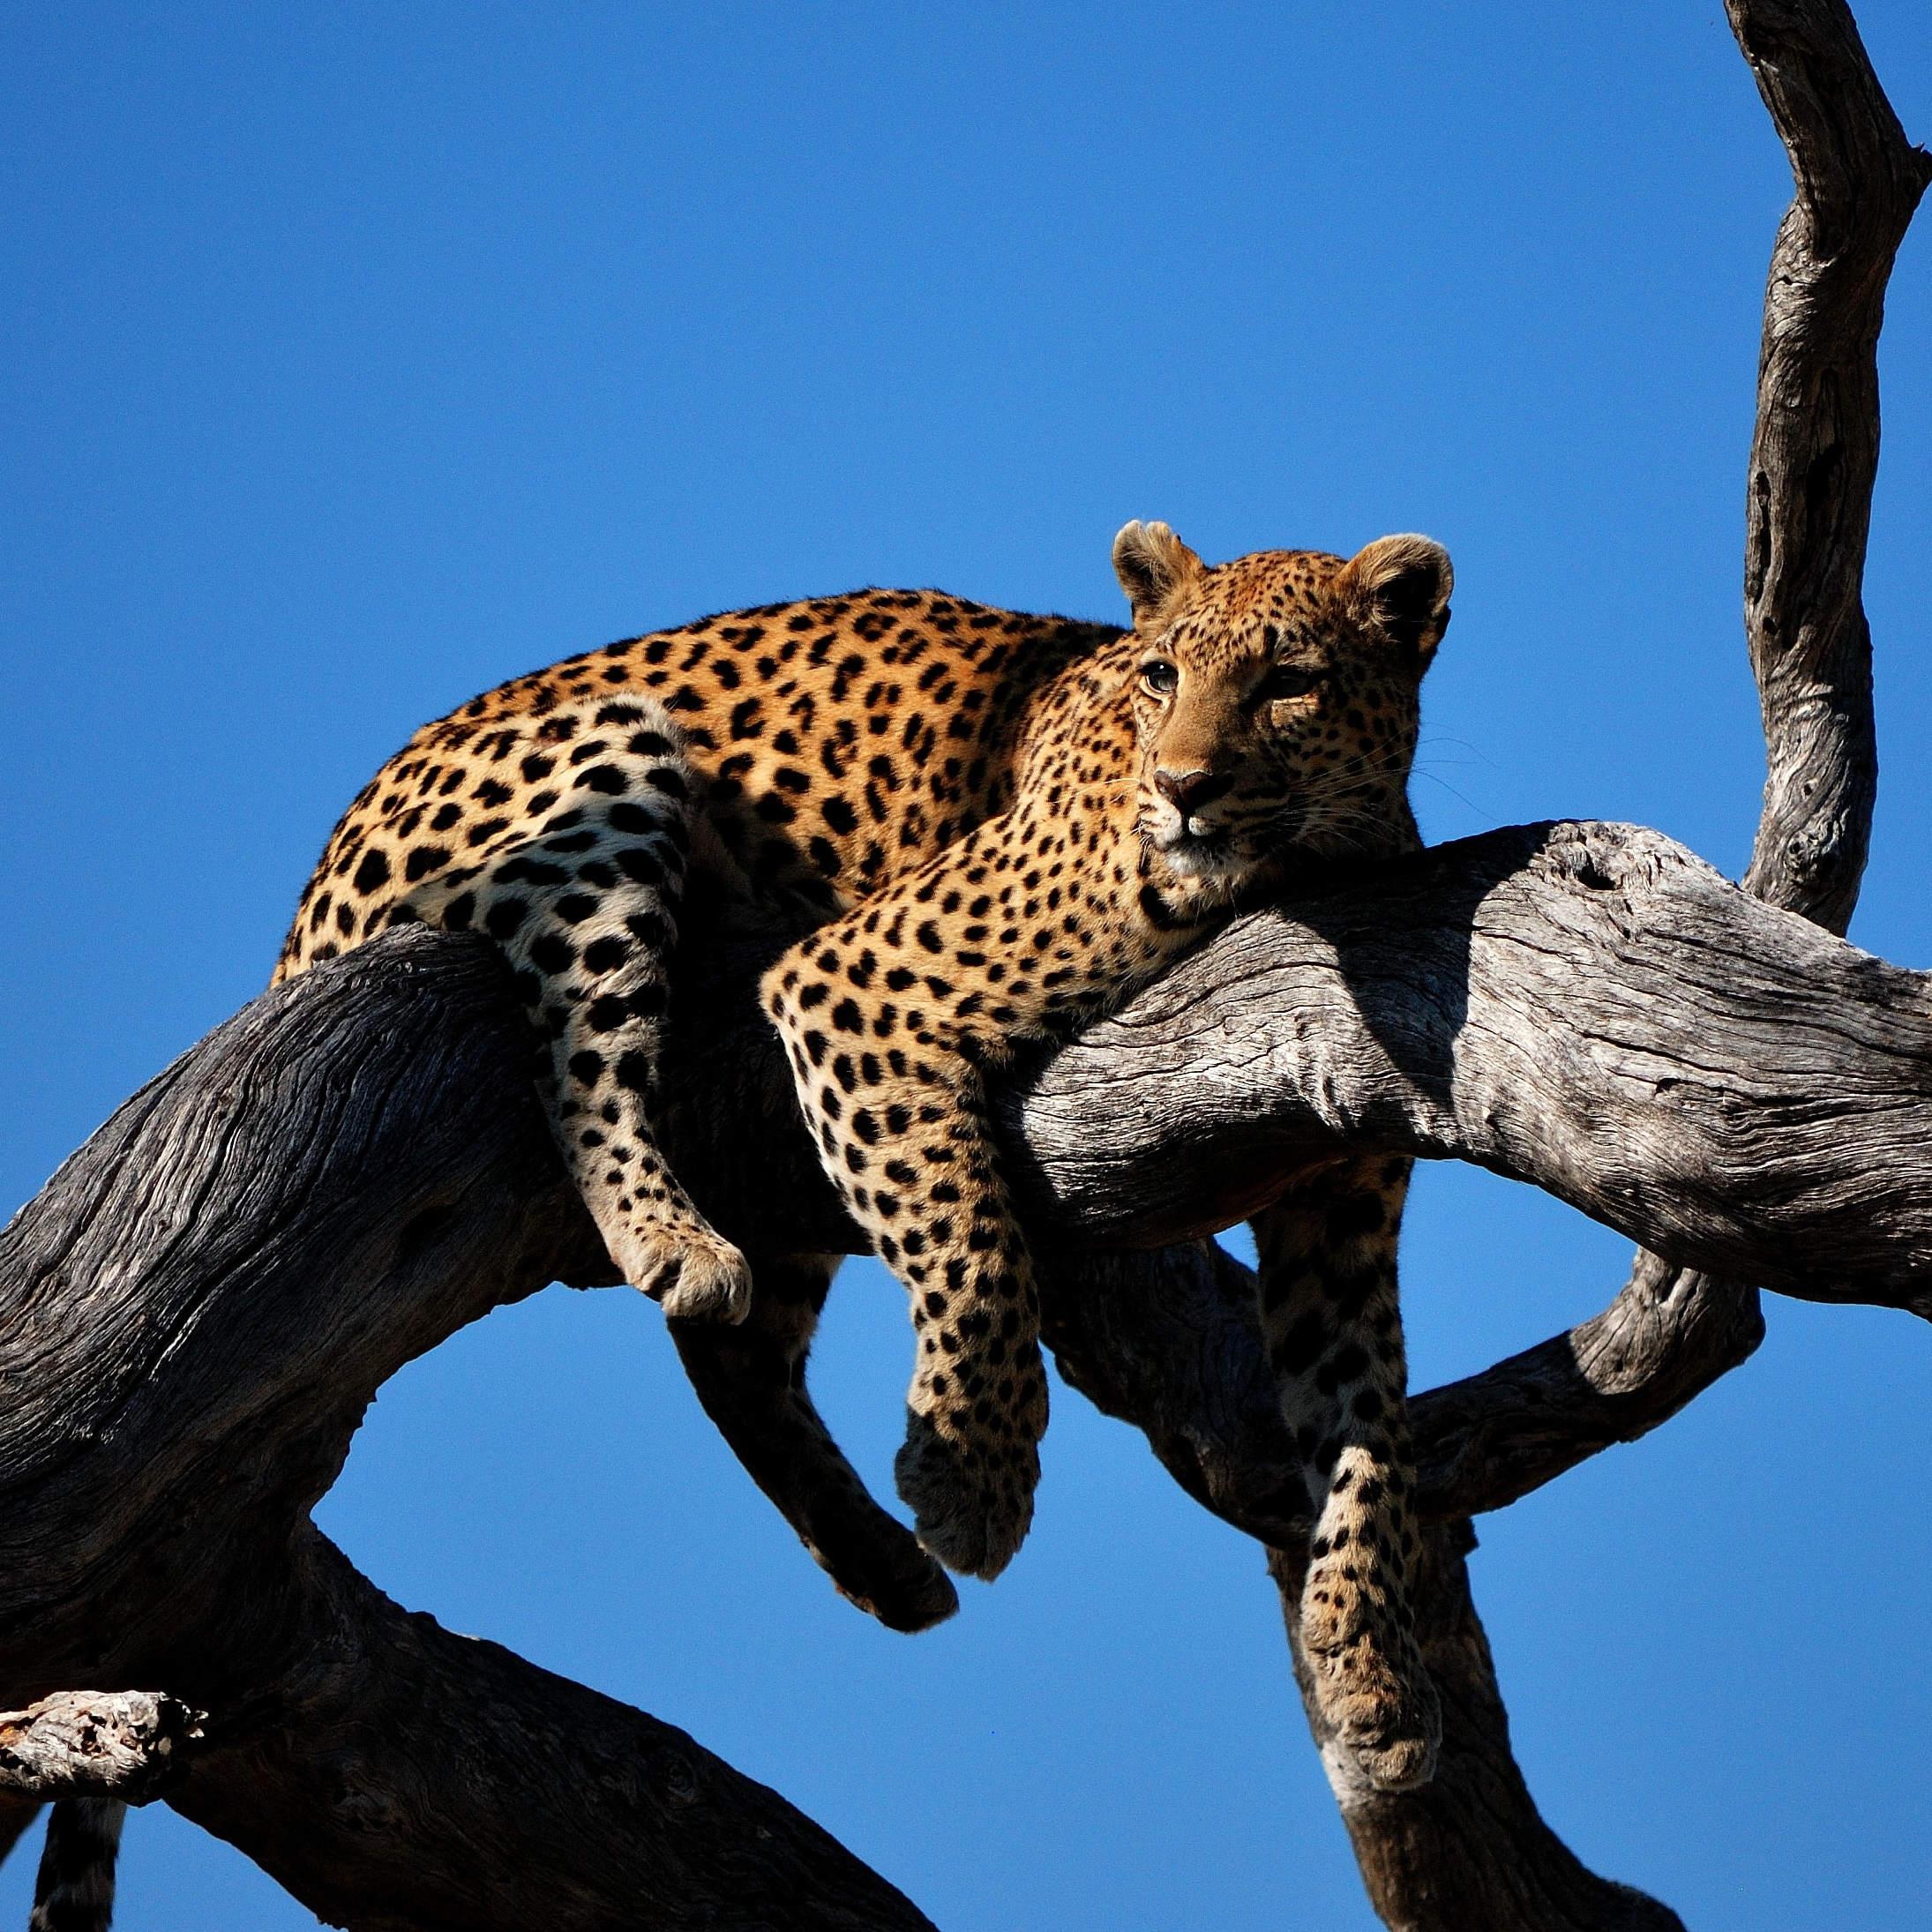 Custom-Travel-Planner-Network-10-Botswana-Leopard-Big-Cats